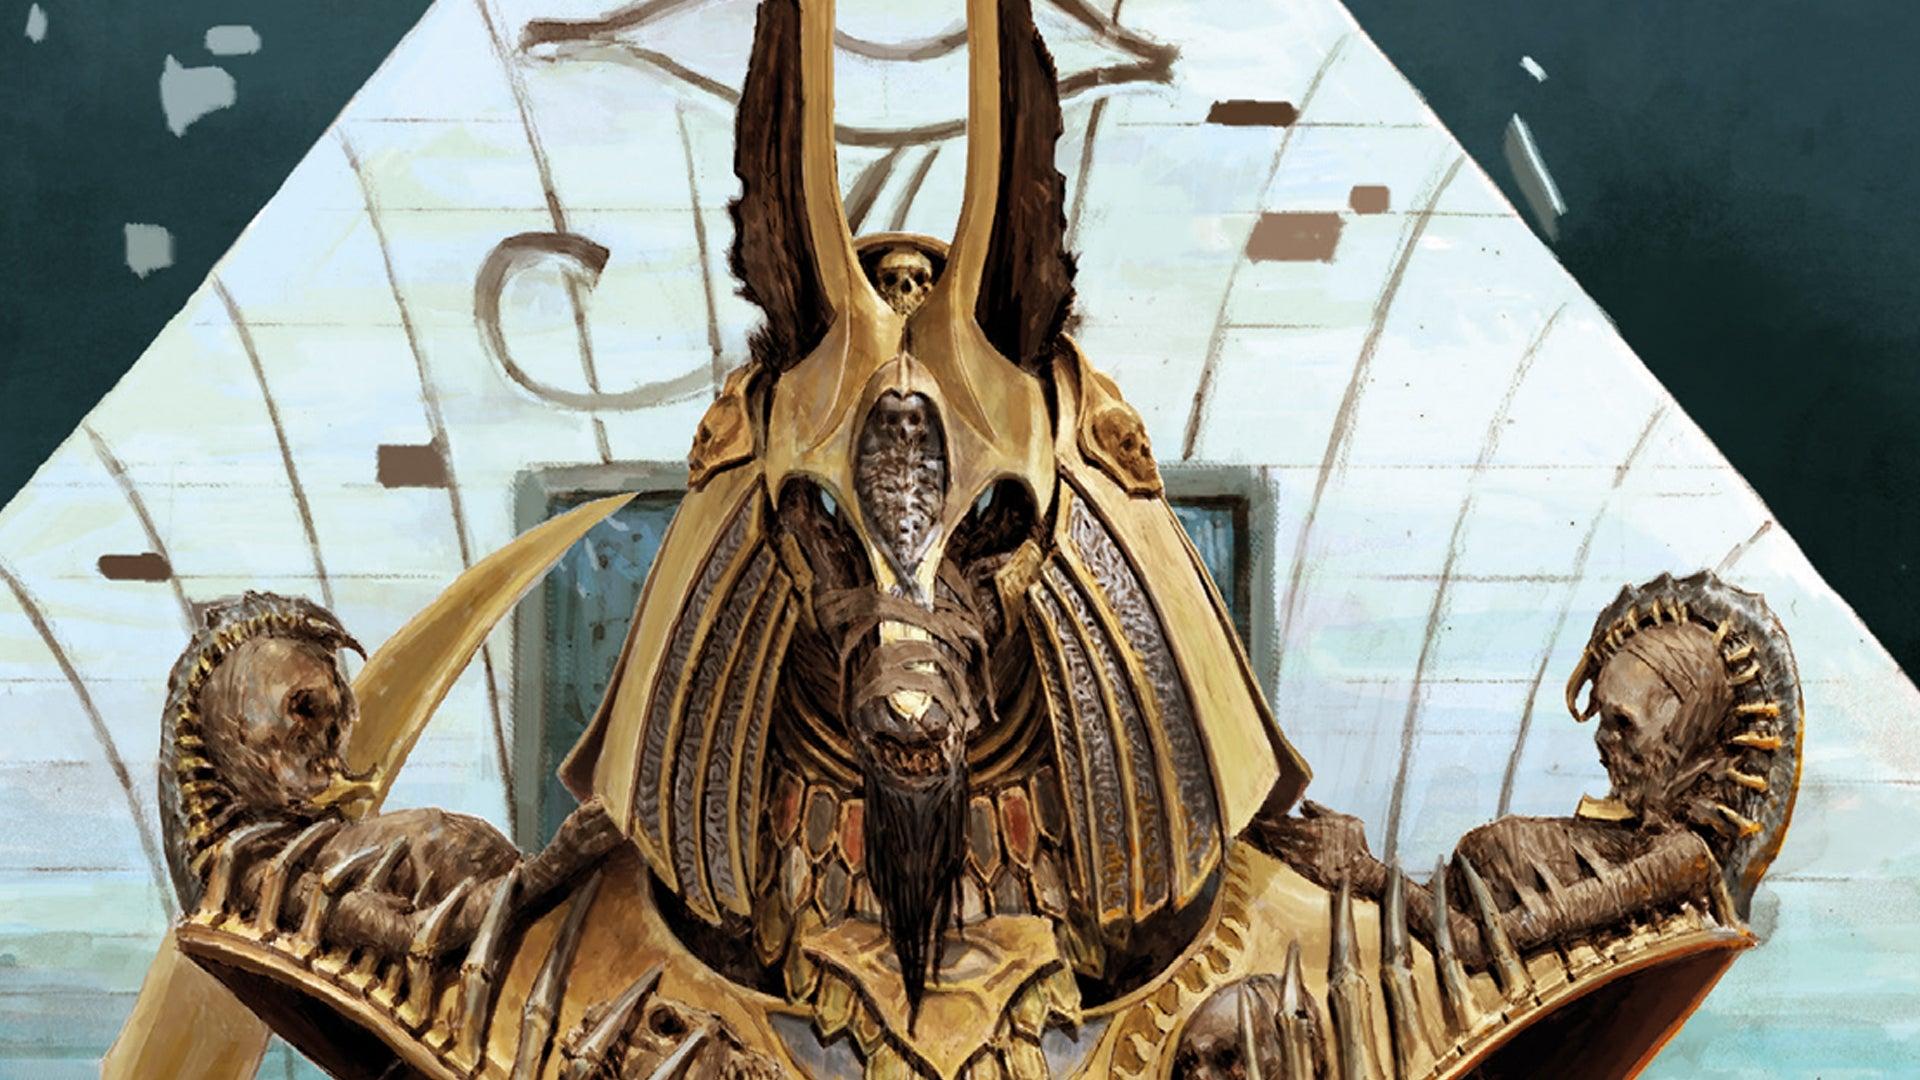 Anubis art 2 Ankh: Gods of Egypt board game